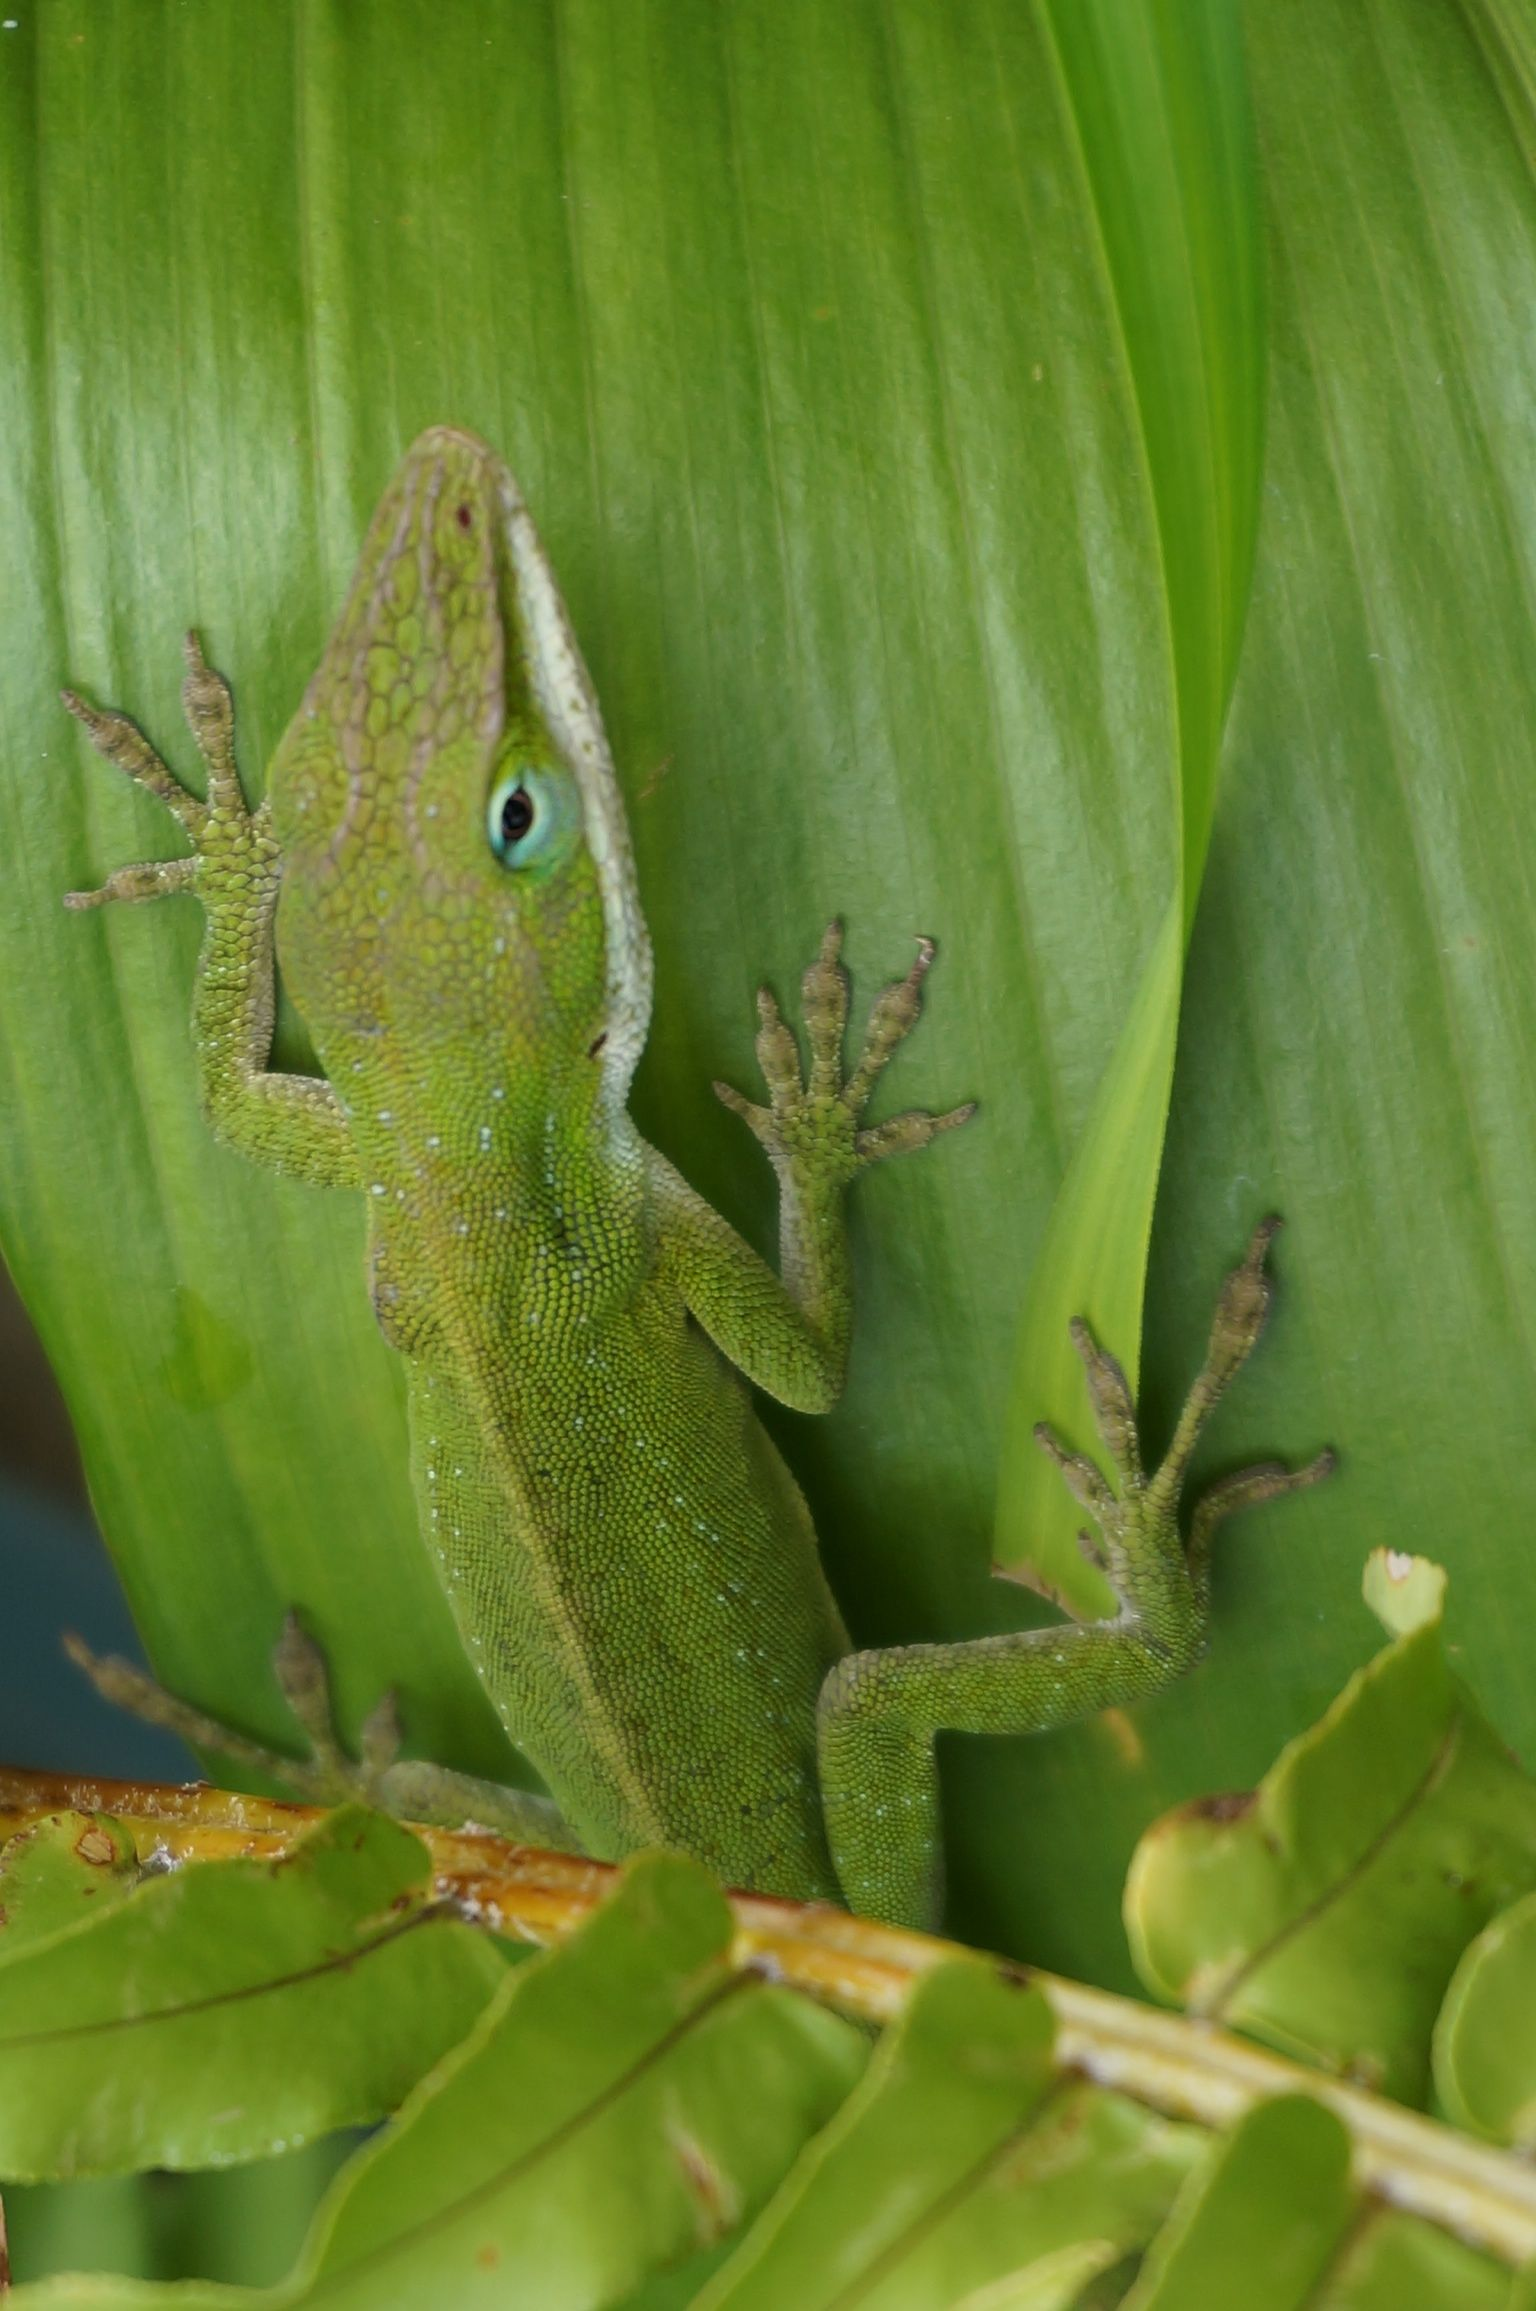 Lizard in Mom's yard, Kauai Hawai'i | Kauai hawaii, Kauai ...